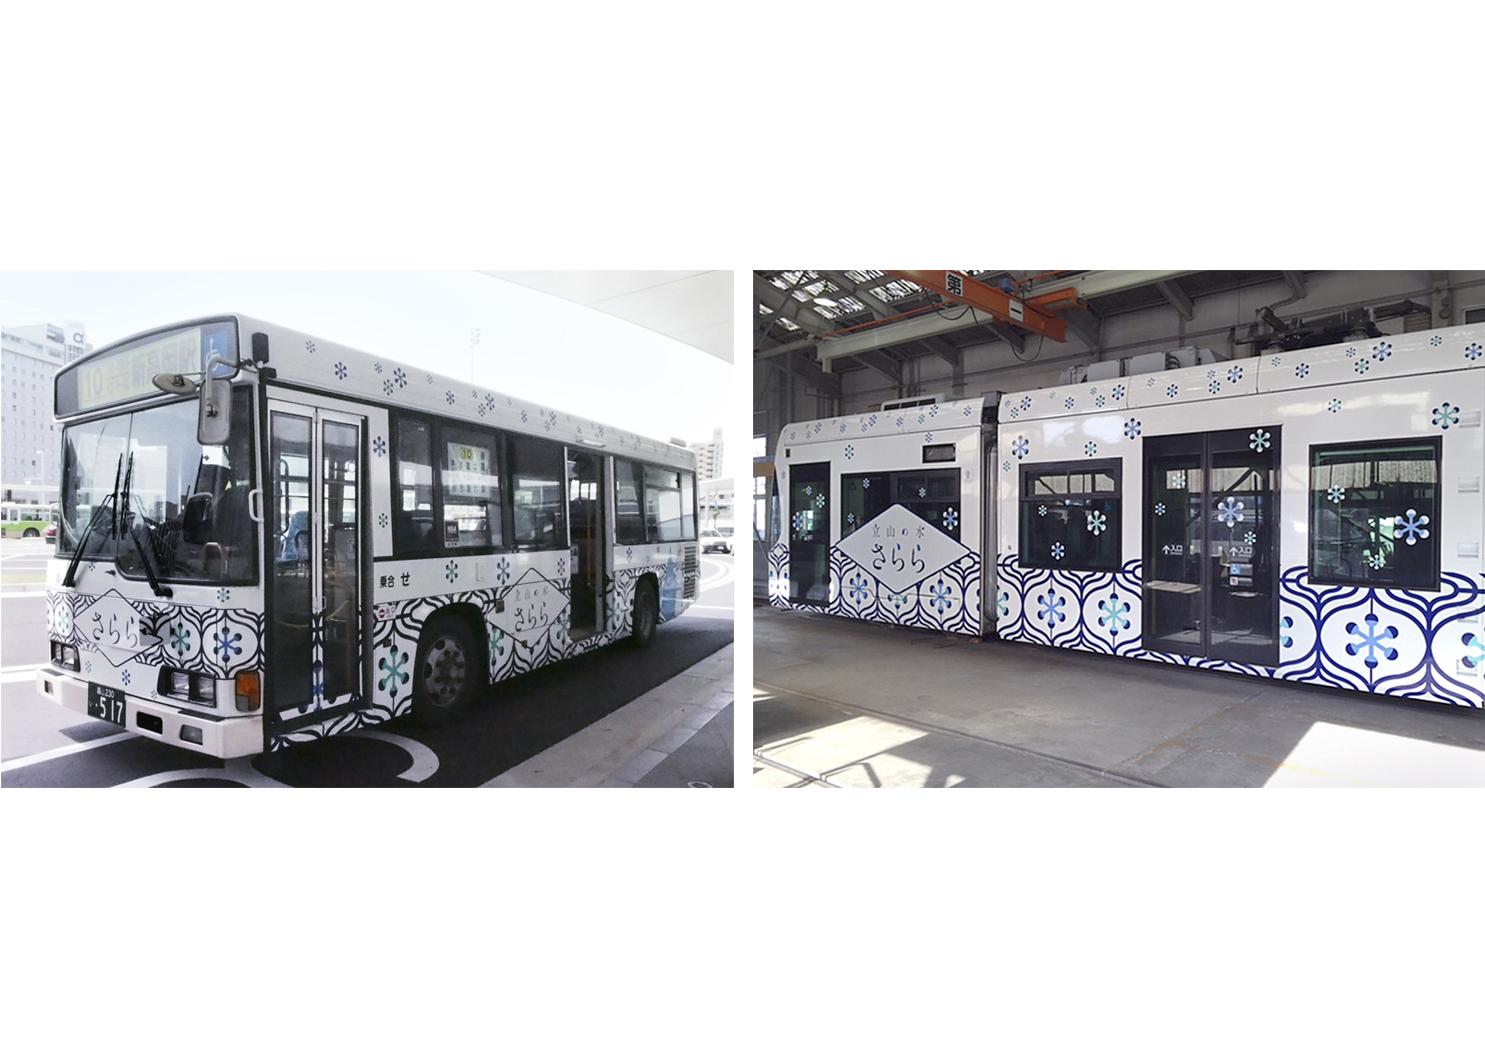 sarara wrapping bus/train